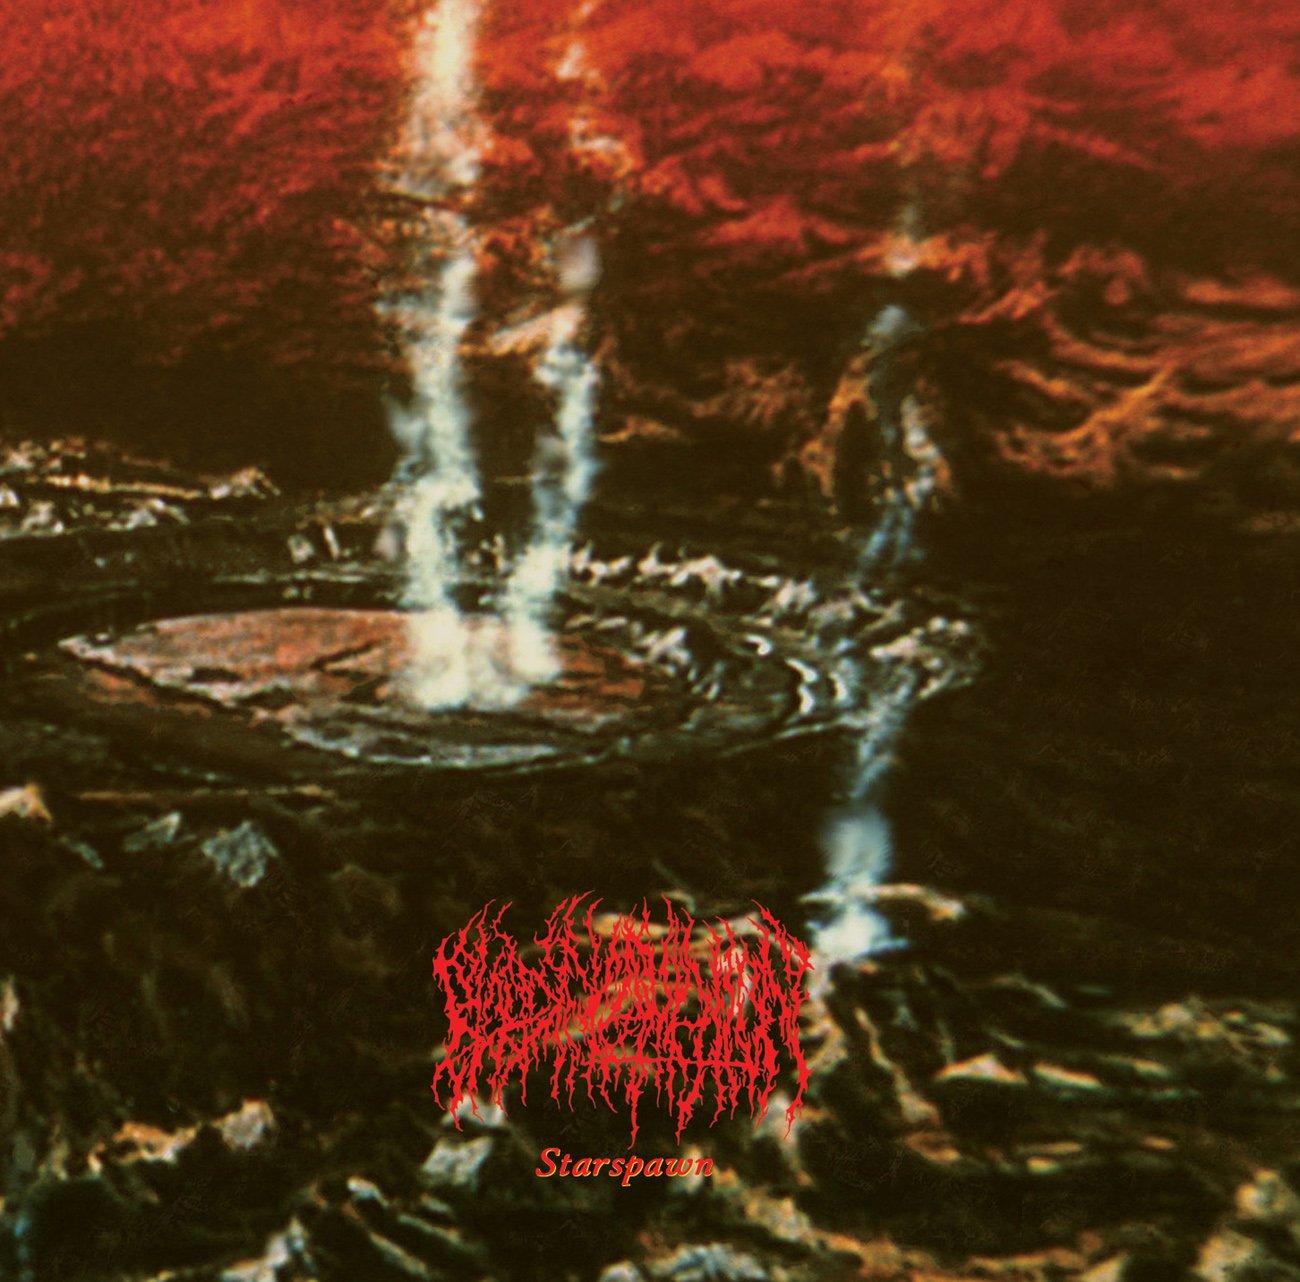 Blood_Incantation_Cover